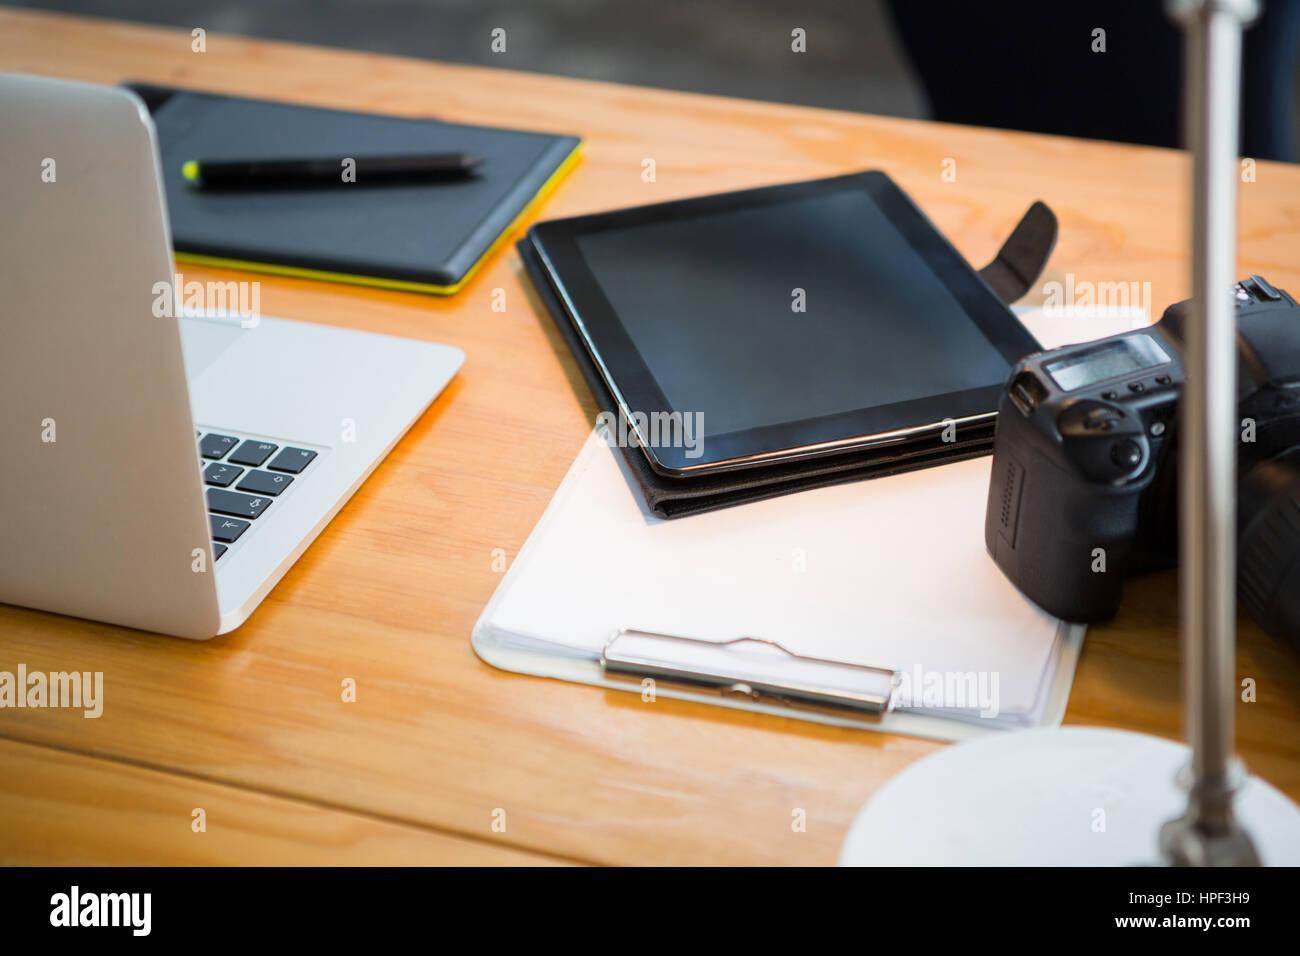 Close-up of laptop, digital tablet and digital camera on desk - Stock Image